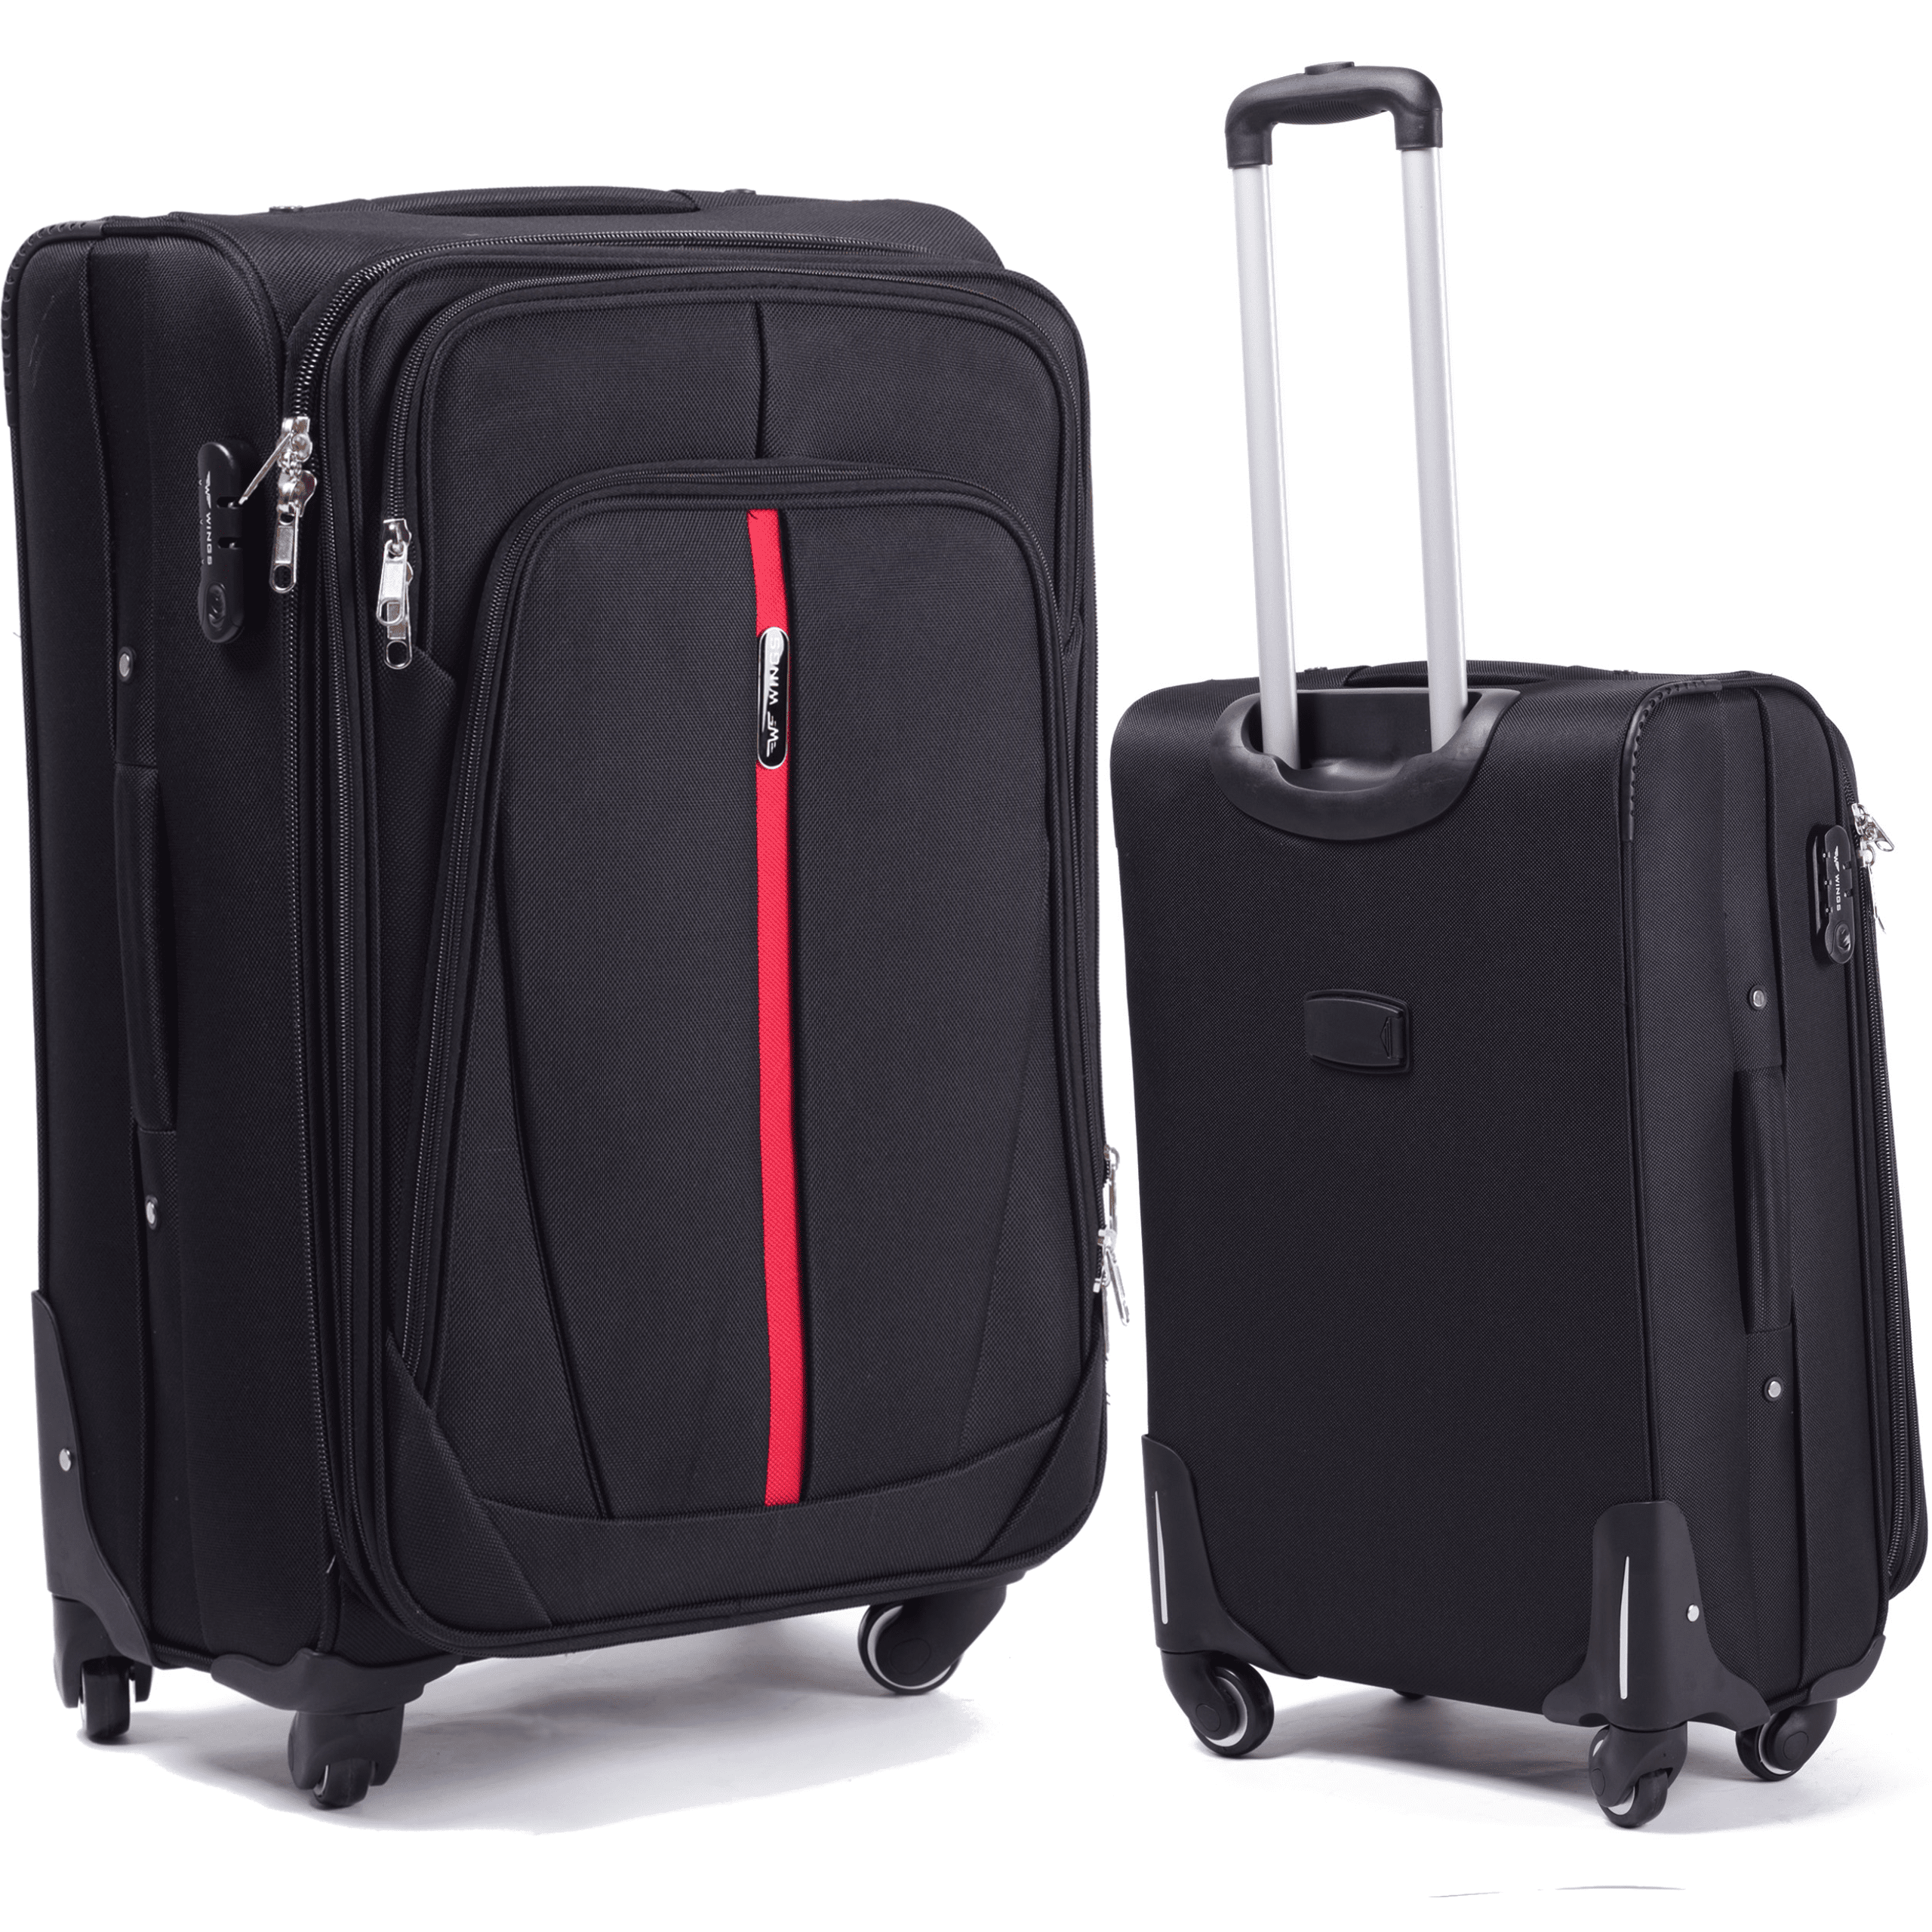 Малый Тканевый Чемодан Wings 1706-4 S Black PREMIUM на 4-х прочных колесах!  Для багажа,до 10 кг